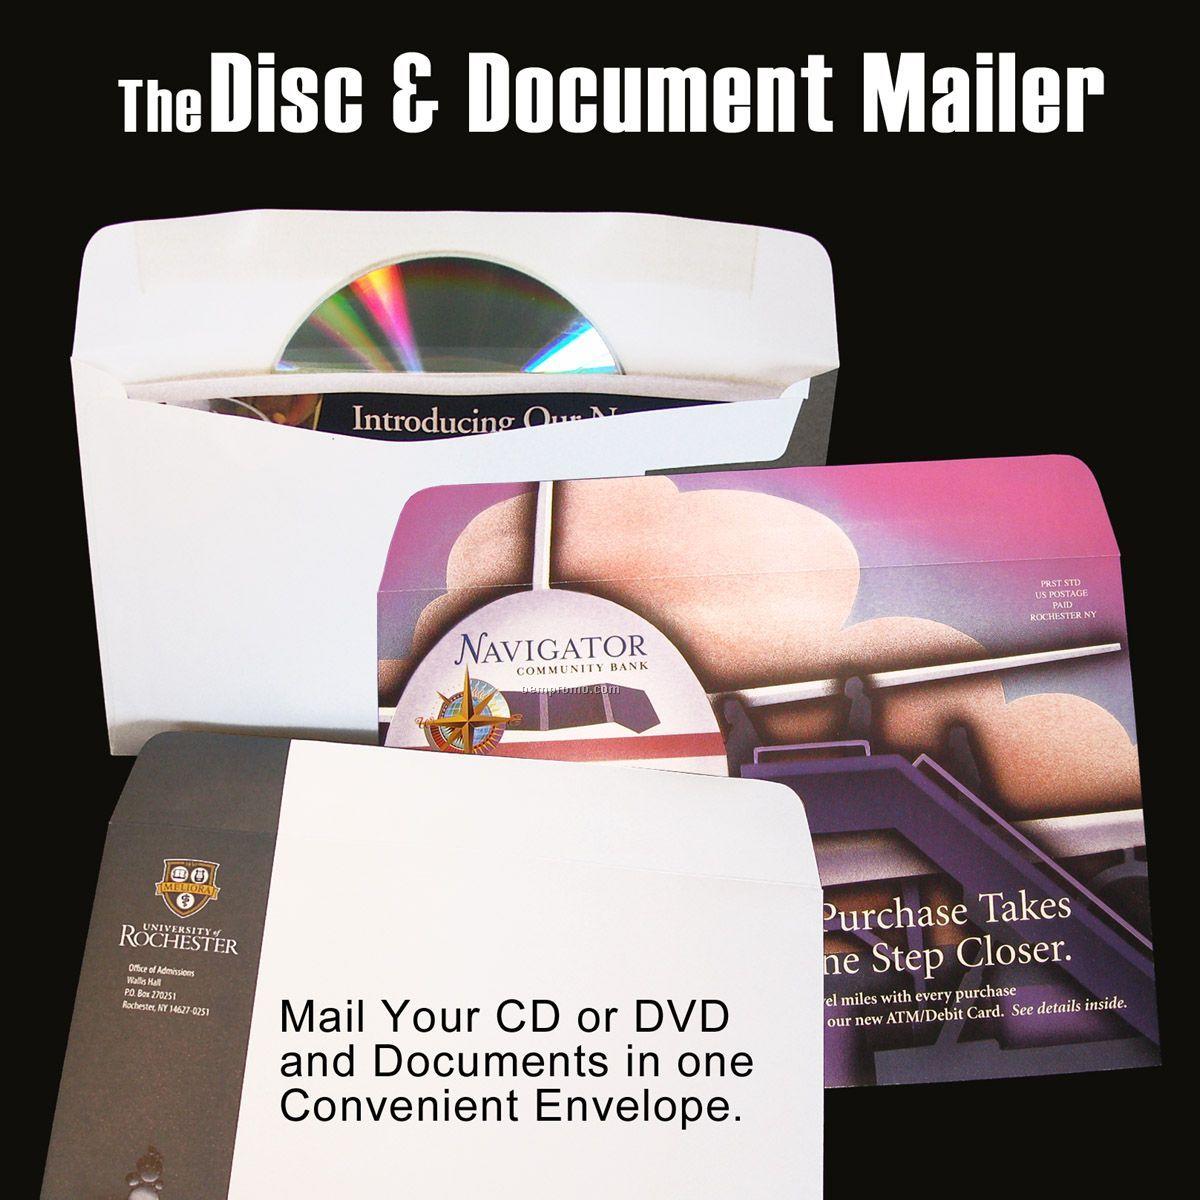 Disc & Document Mailer - 4 Color Disc & Document Mailer